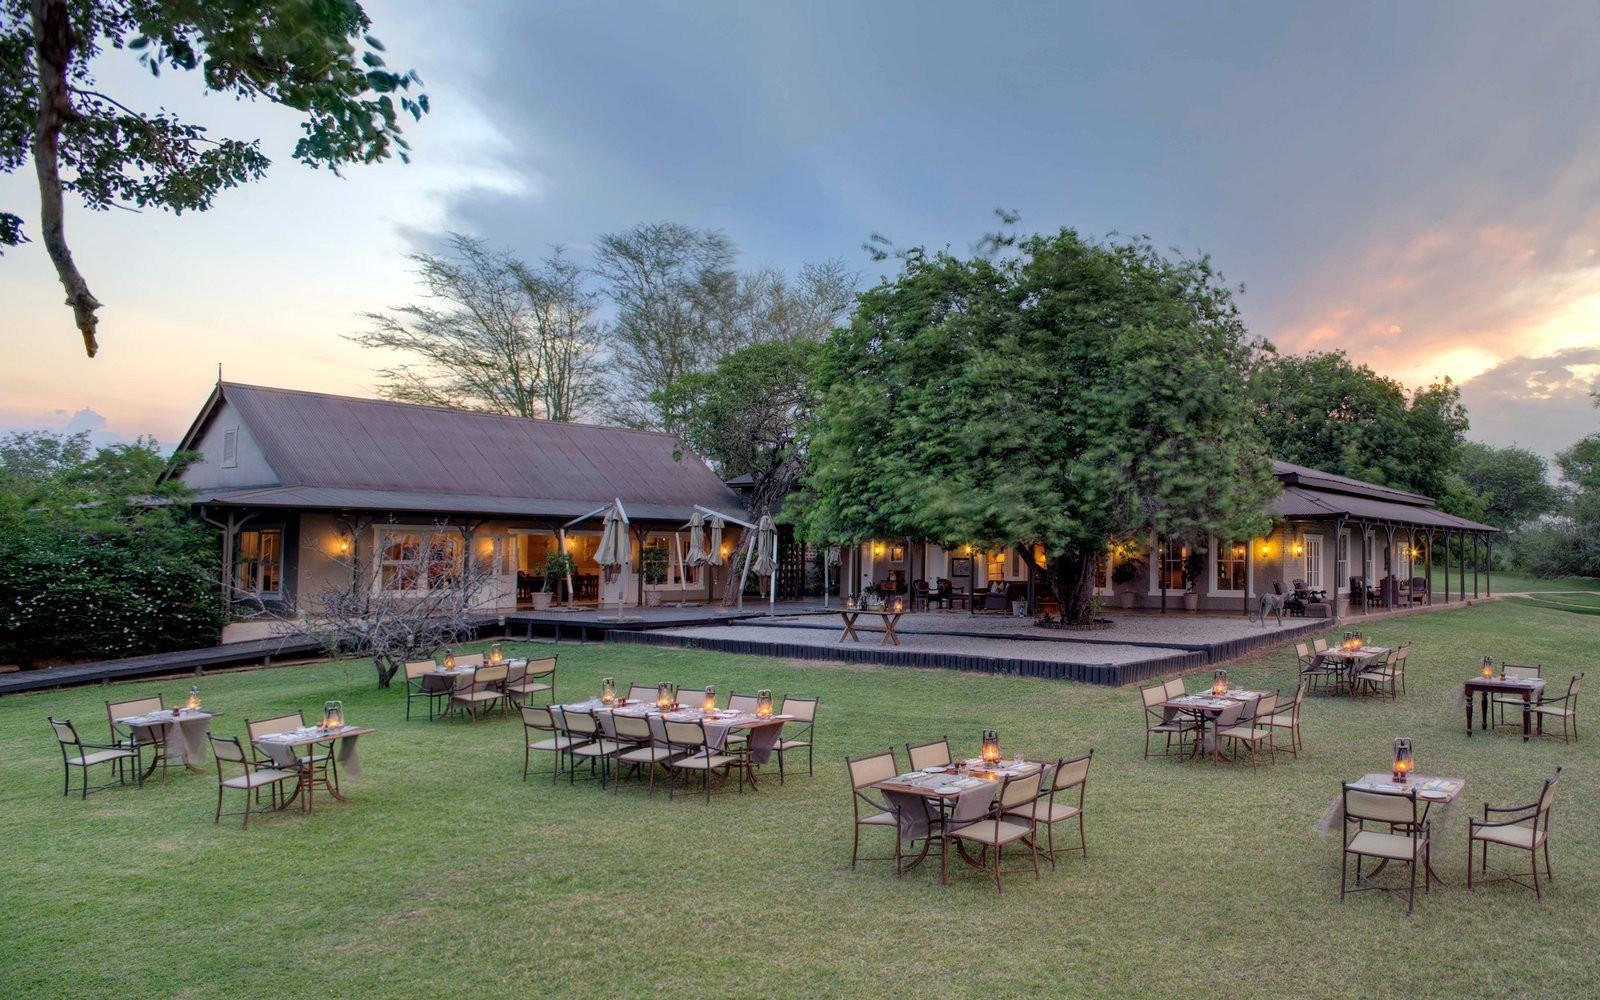 The Top 5 Safari Lodges in Africa